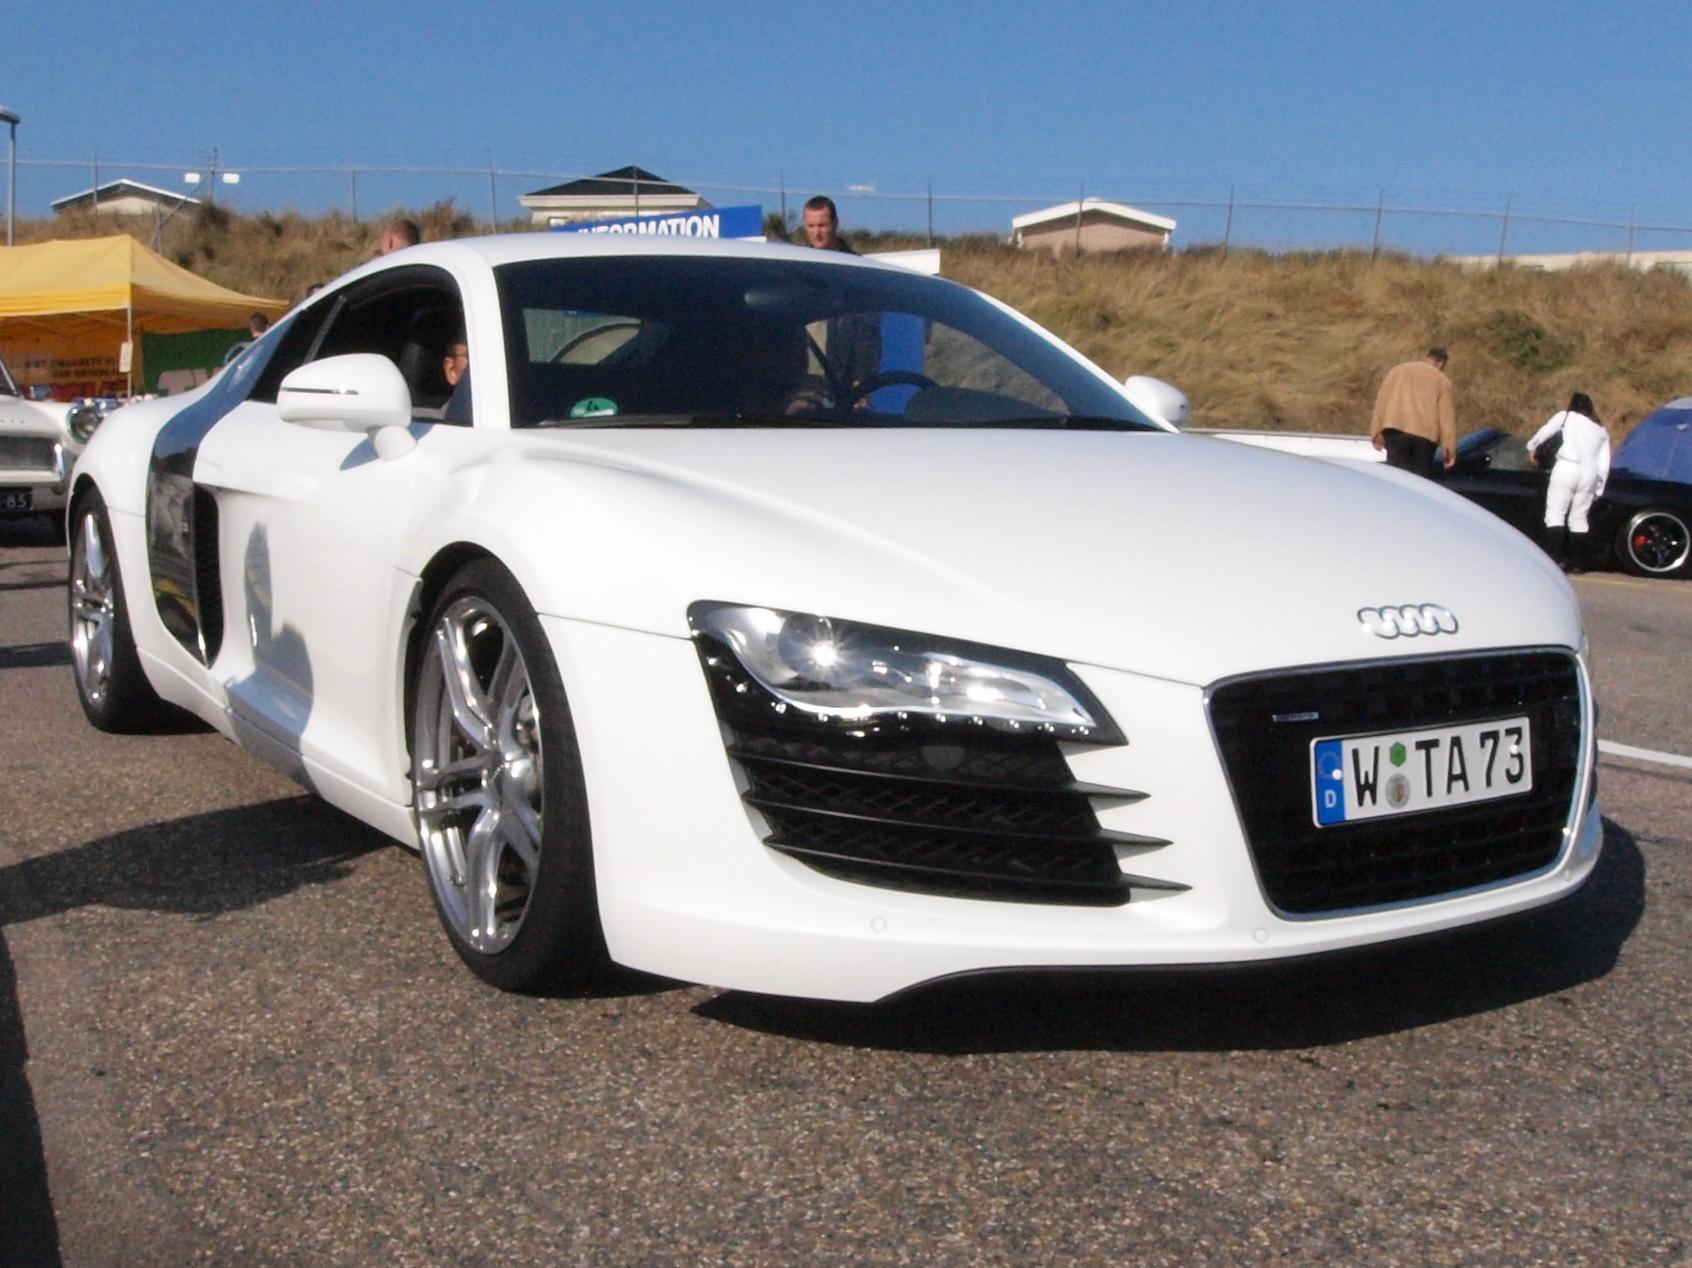 File Audi German Licence Registration W Ta 73 Jpg